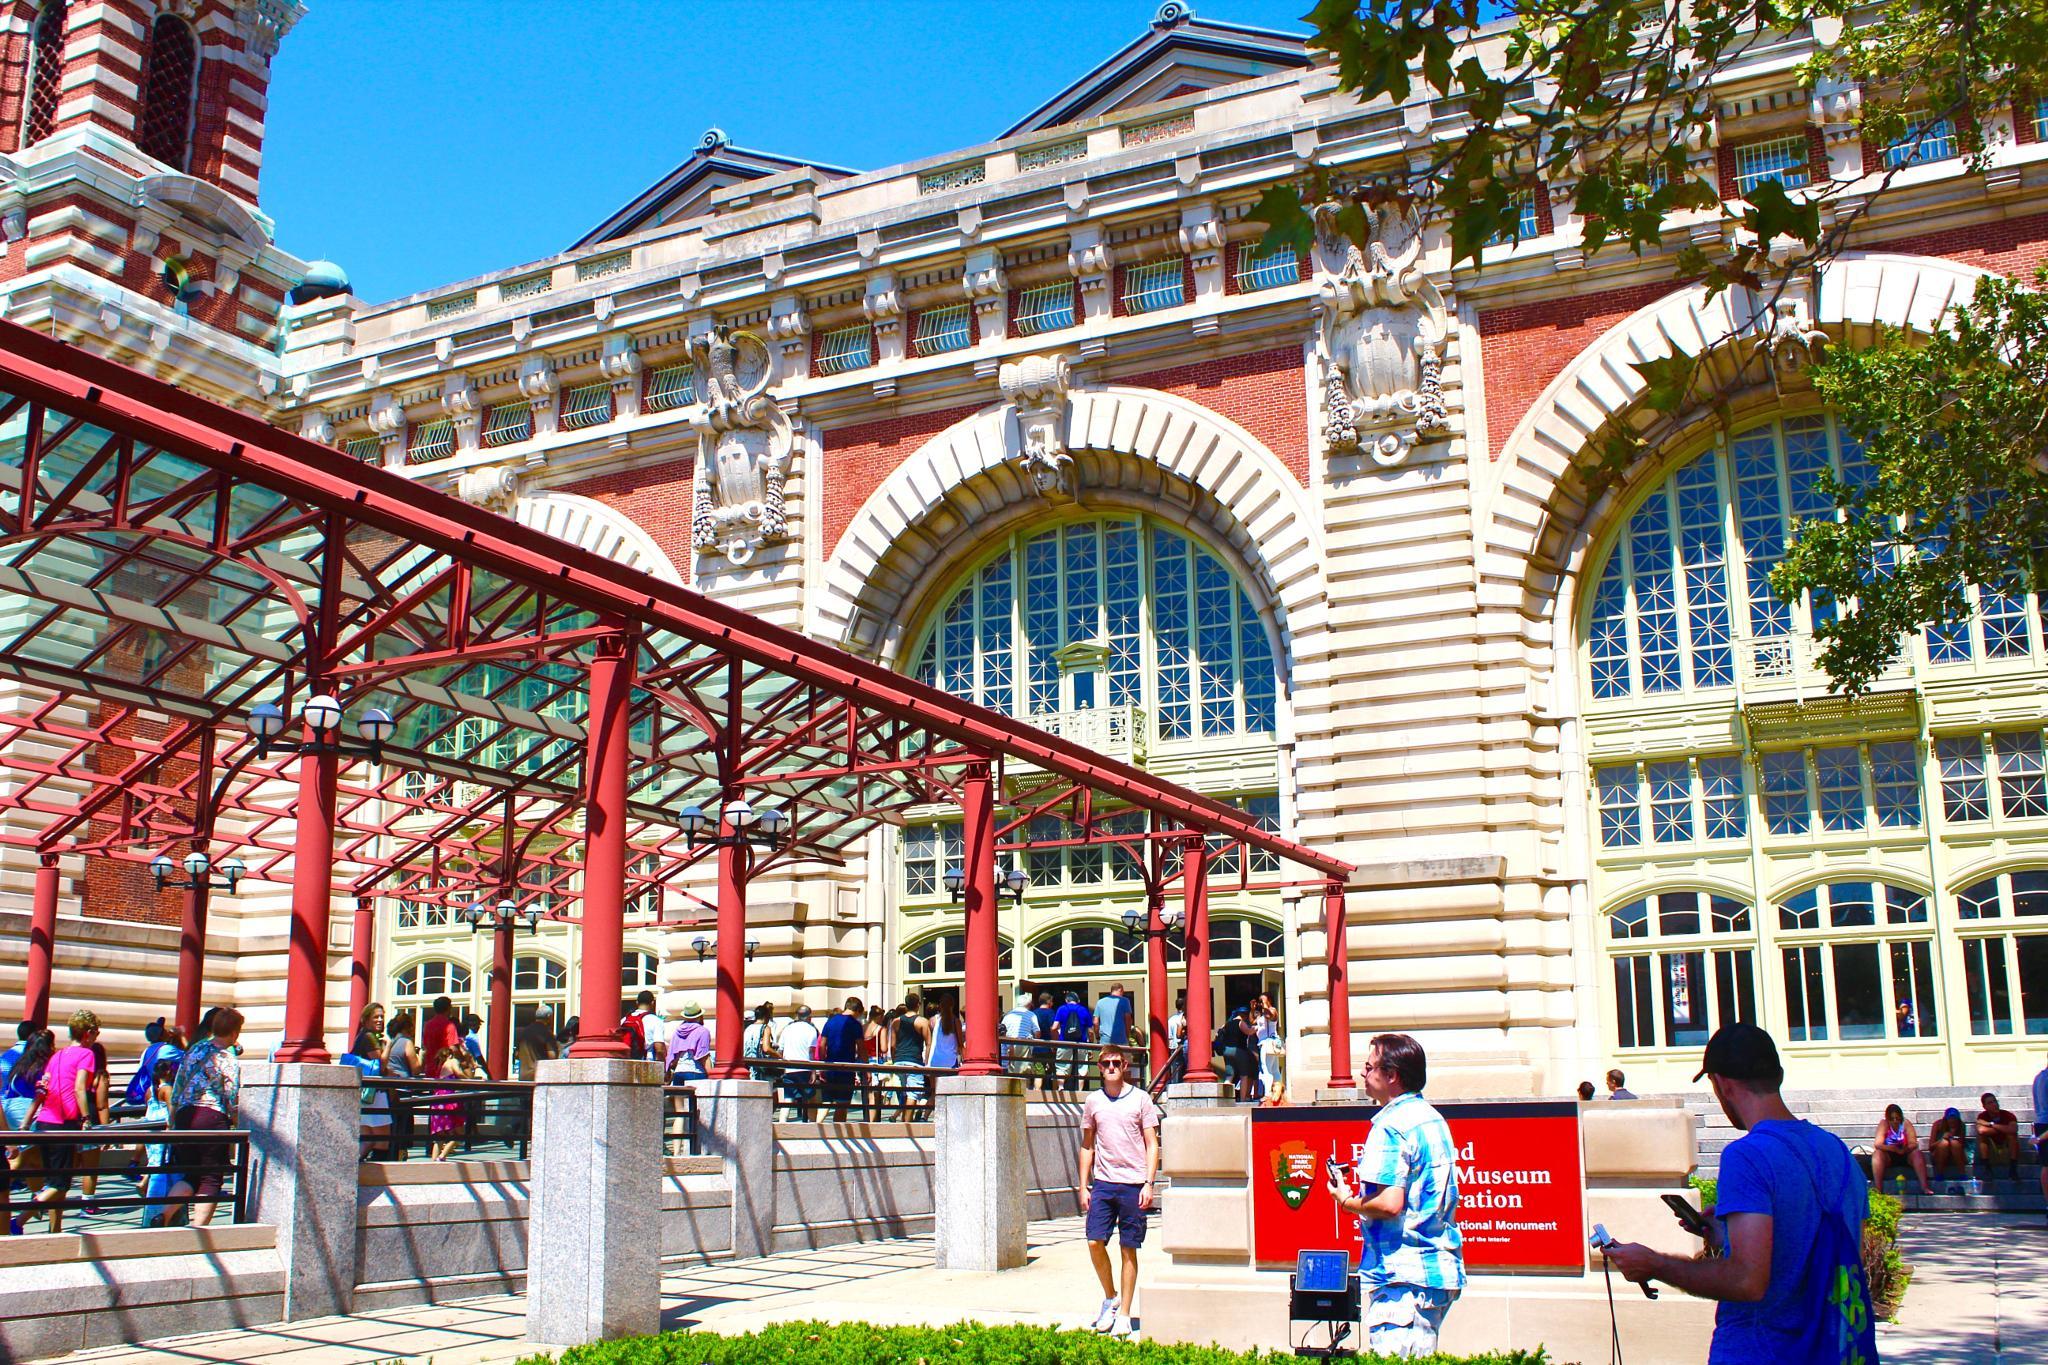 Ellis Island by Snickandmephotography